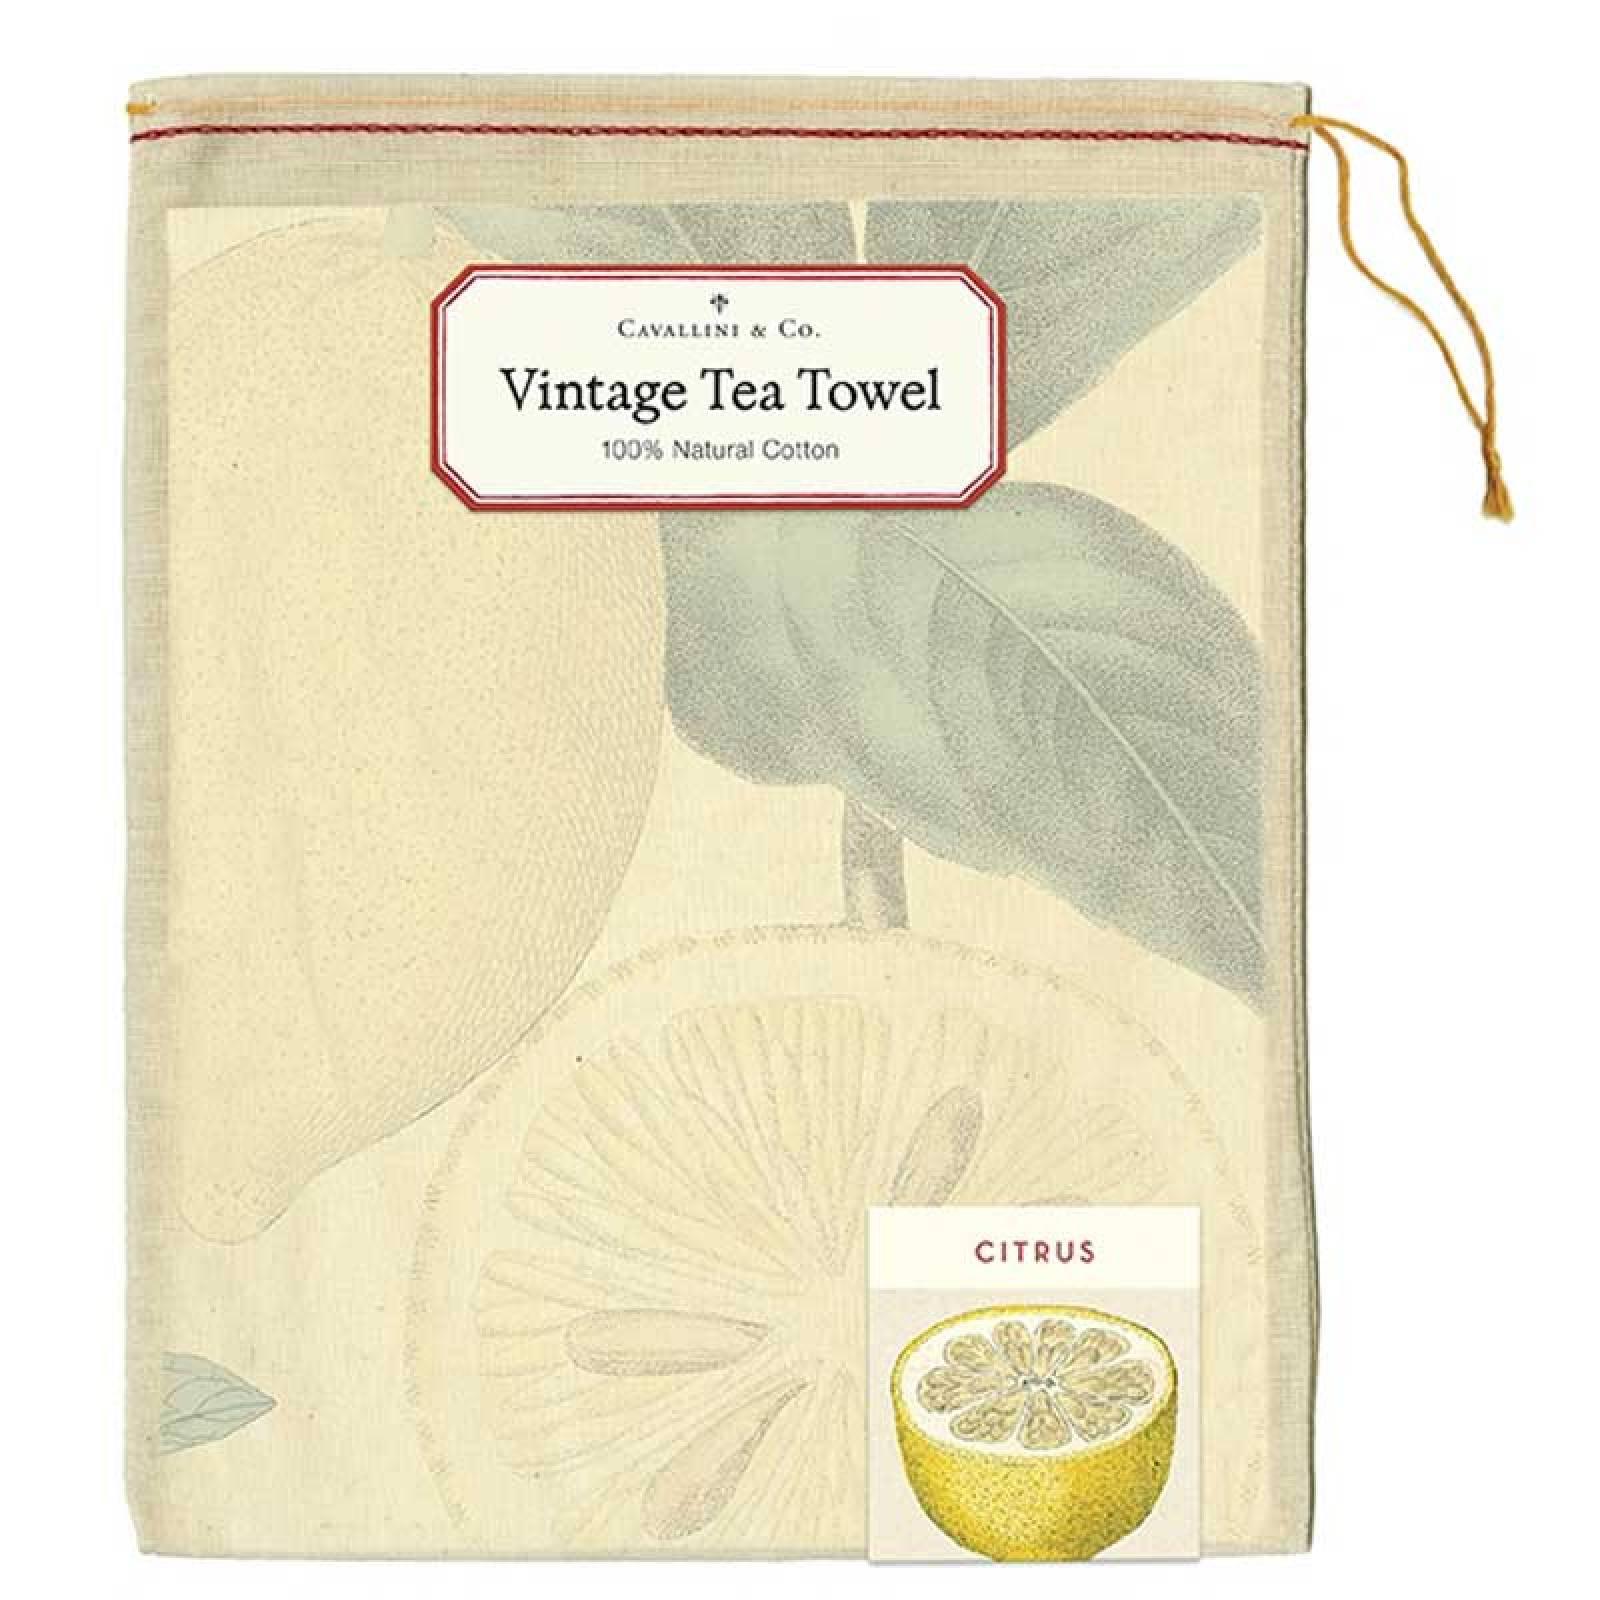 Citrus Tea Towel With Gift Bag thumbnails